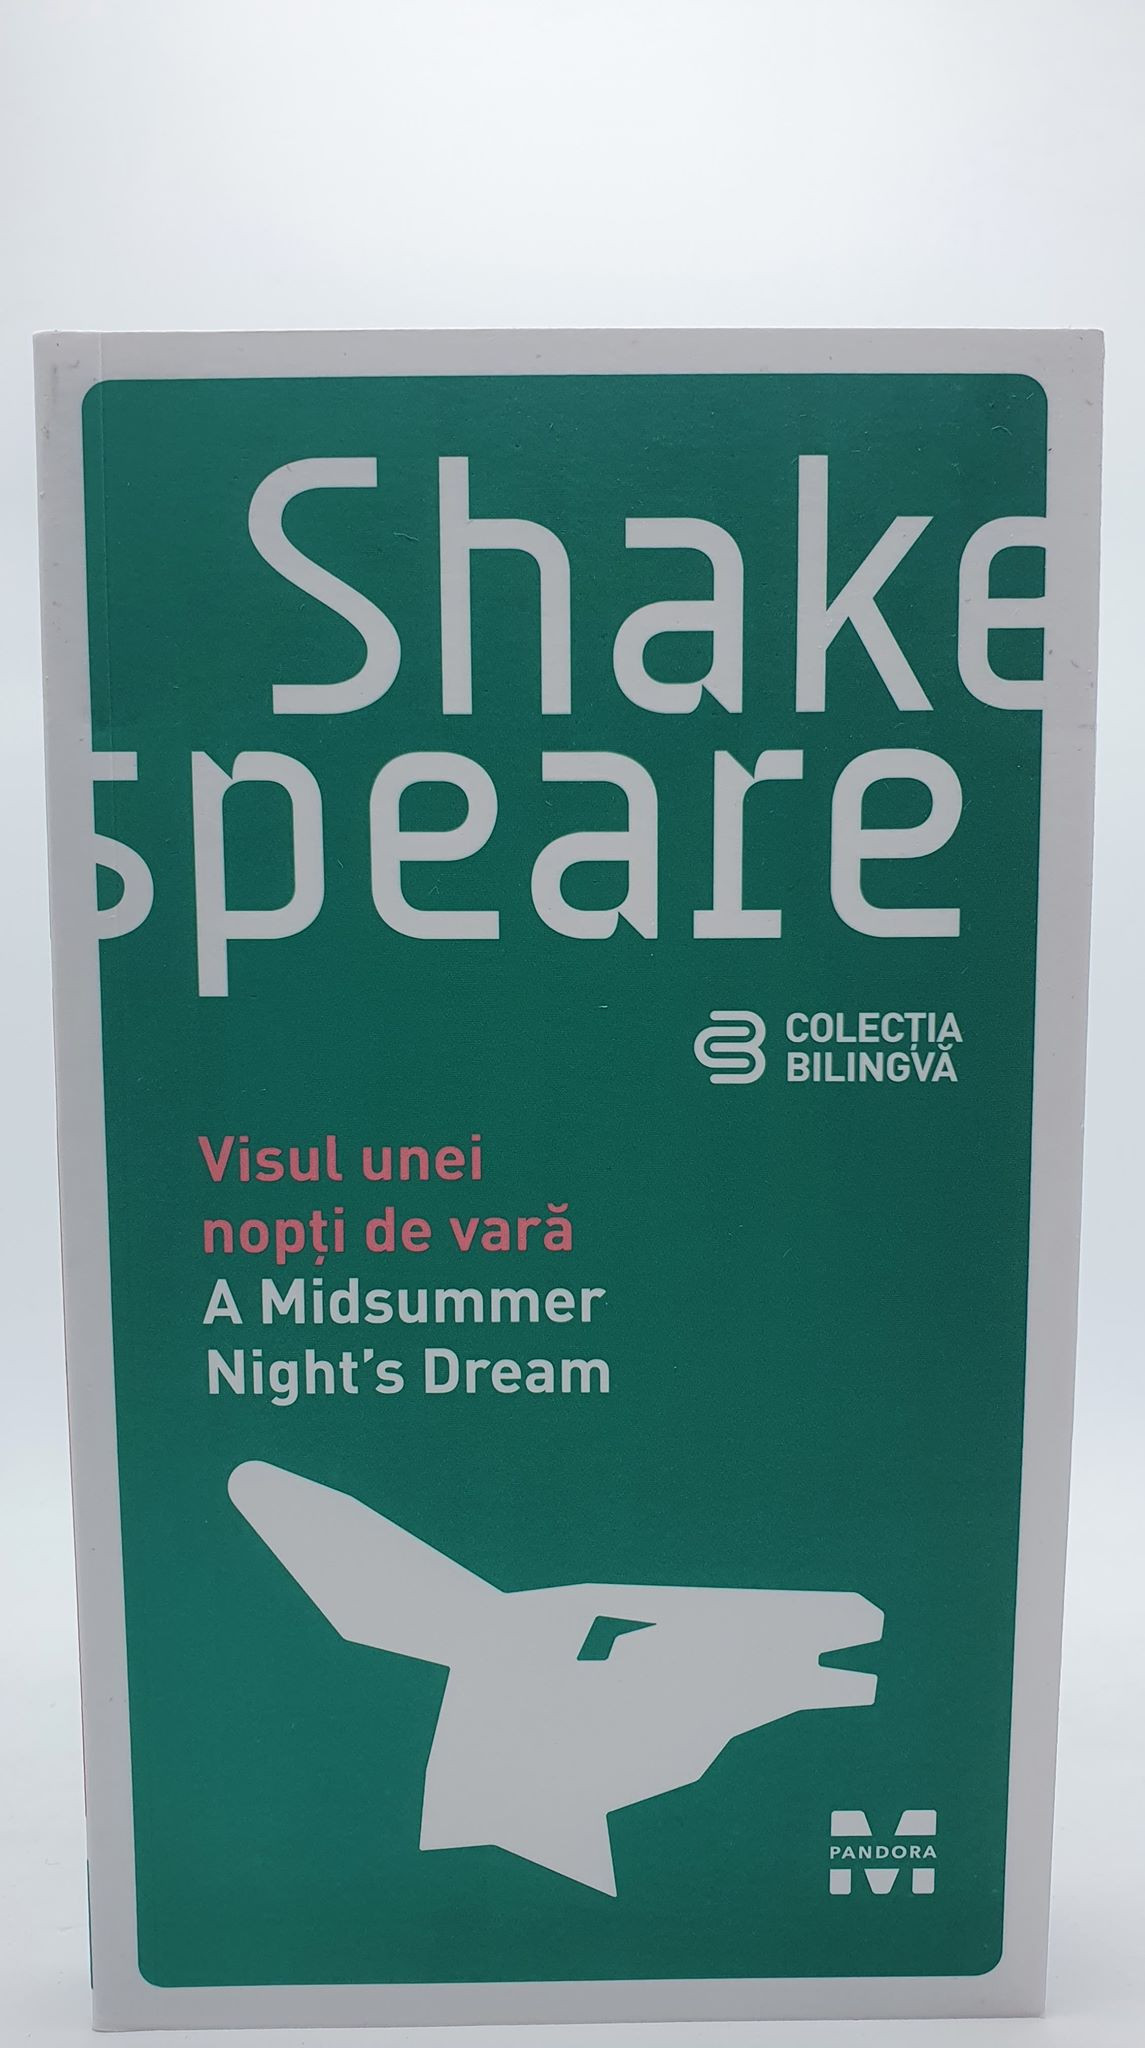 Shakespeare Visul unei nopti de vara// A Midsummer Night's Dream